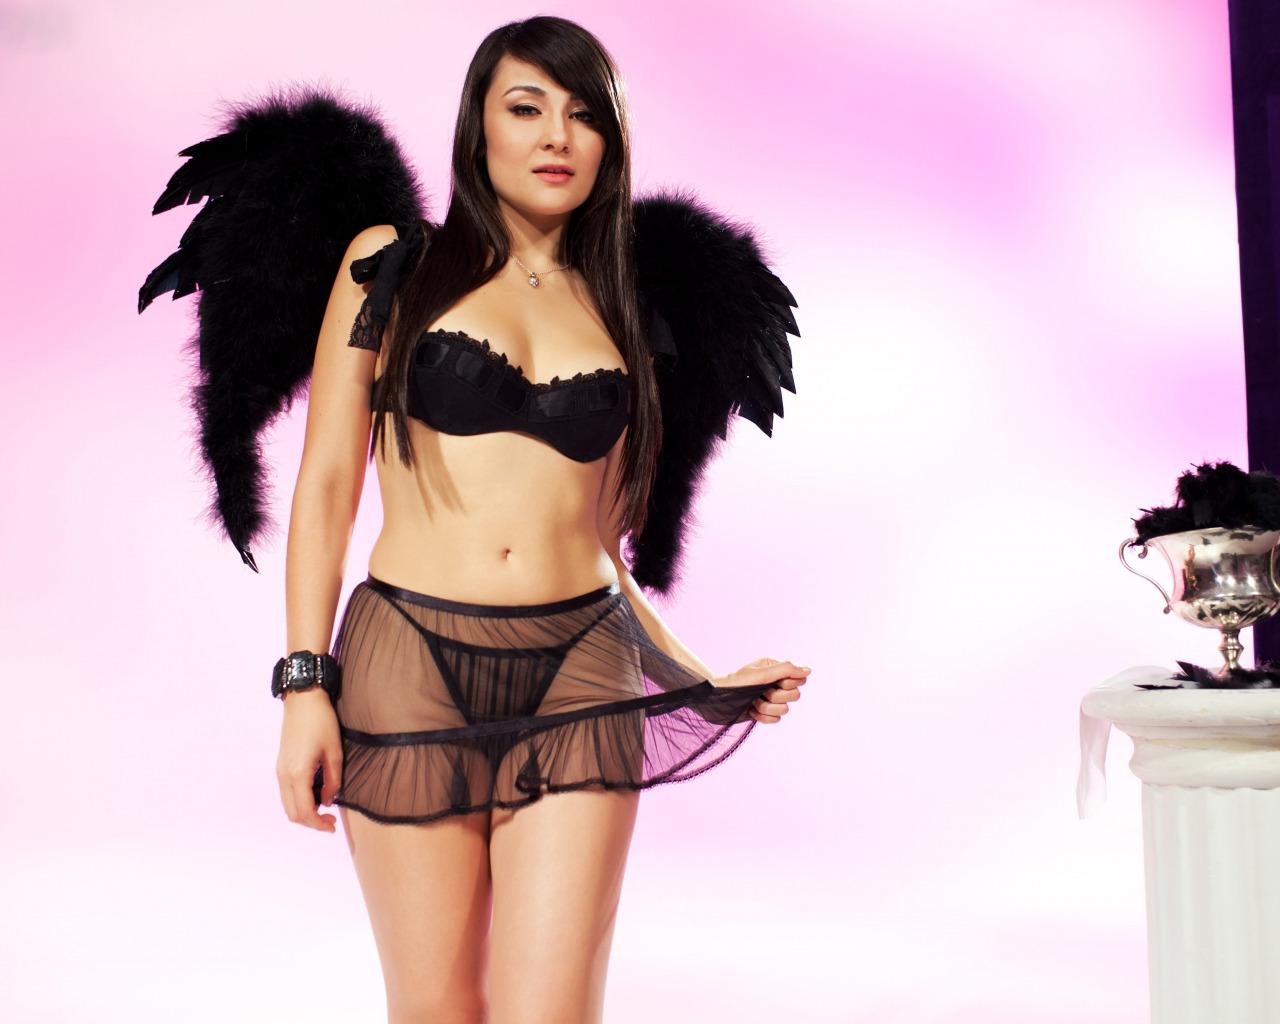 Nude women semi lingerie